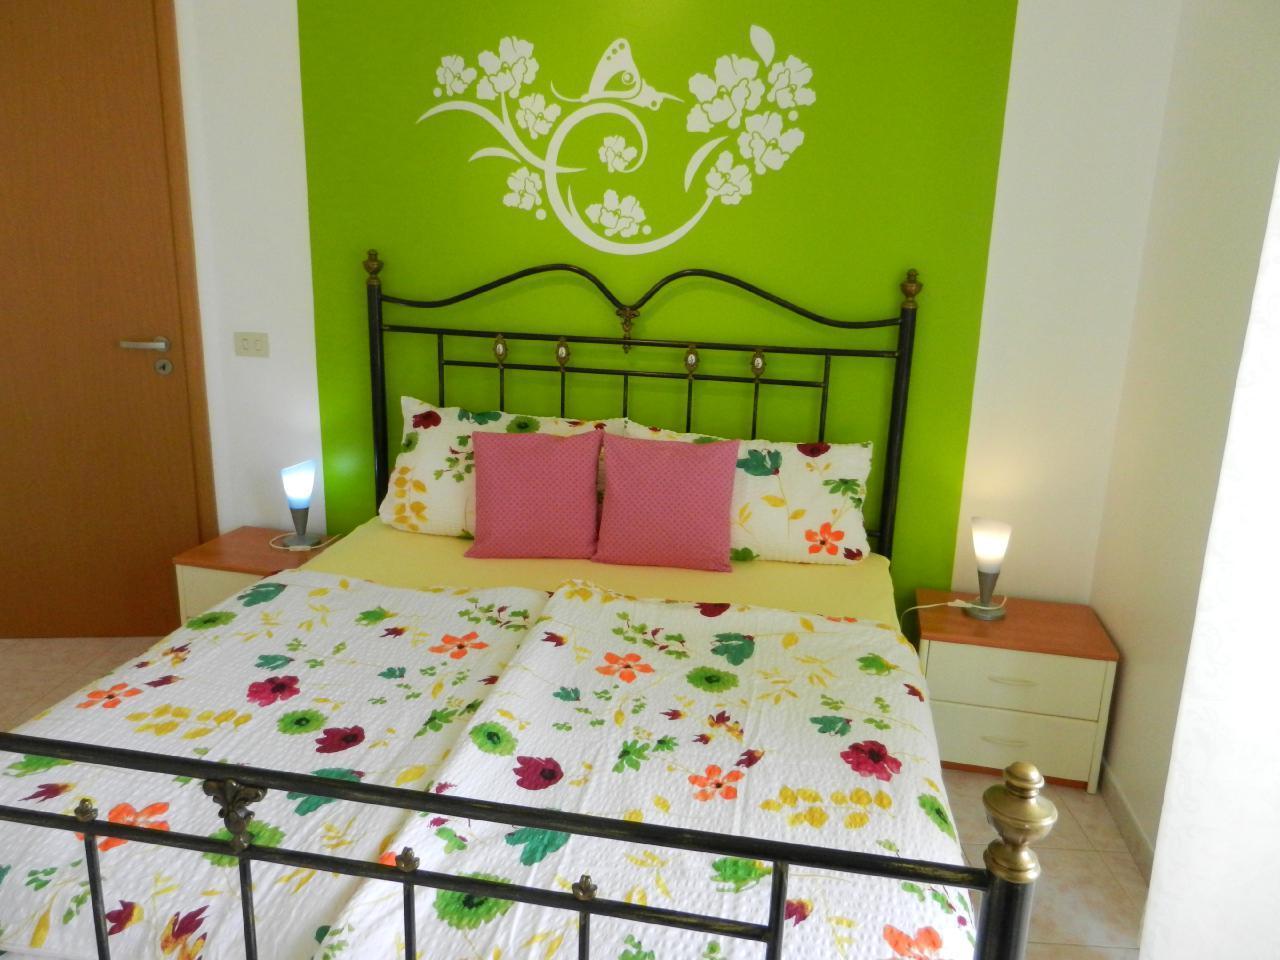 Appartement de vacances Fewo mit Balkon im Panorama-Dorf bei Taormina (737398), Forza d'Agro', Messina, Sicile, Italie, image 4